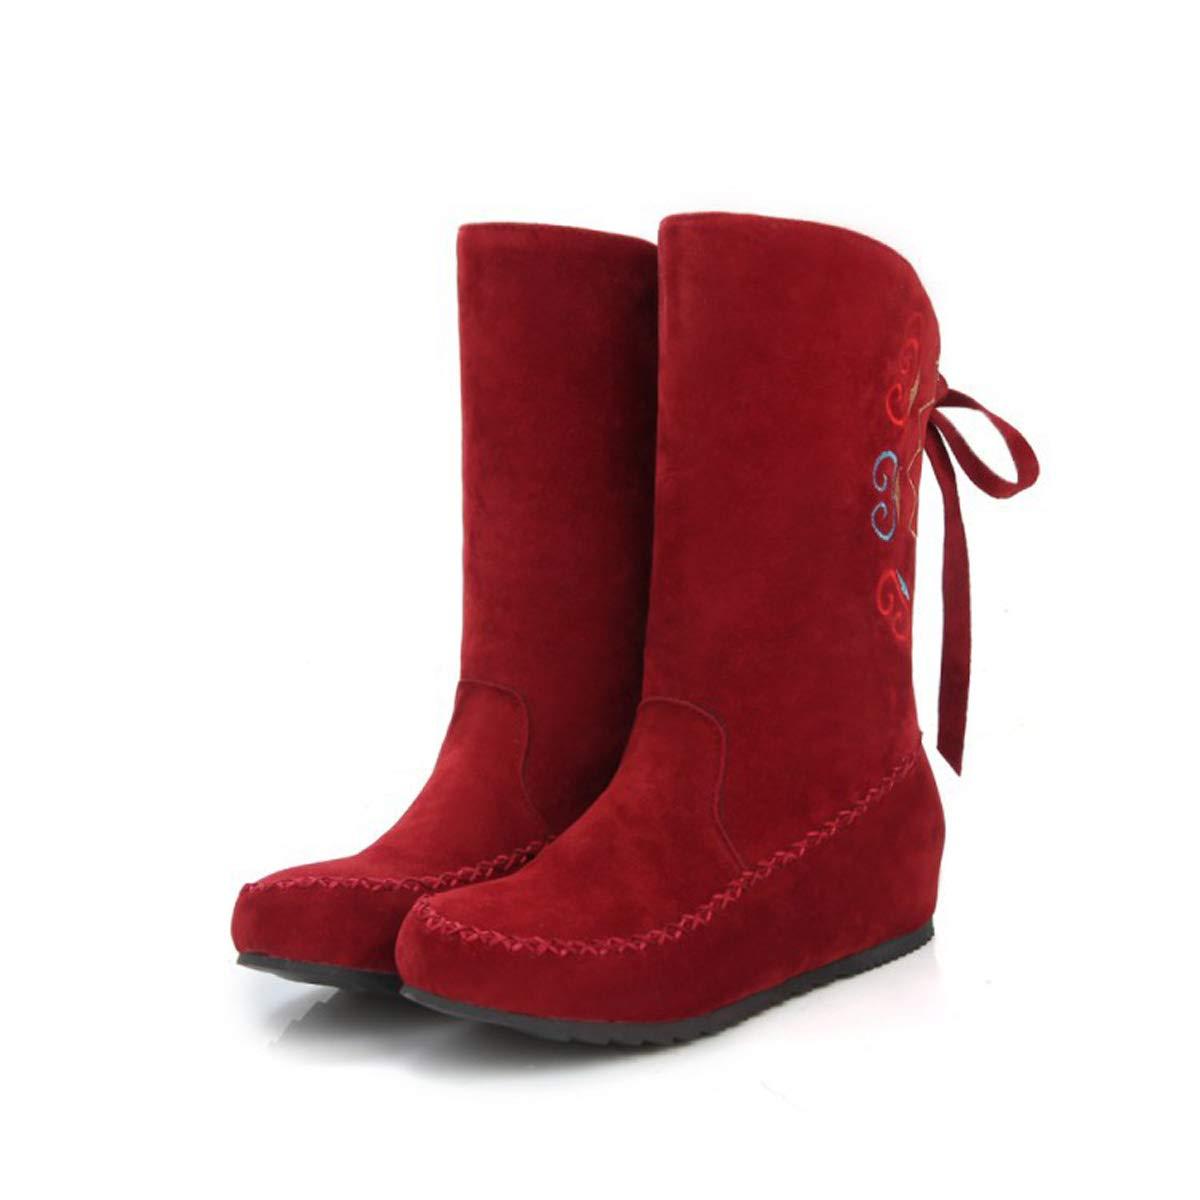 DANDANJIE DANDANJIE DANDANJIE Botas de Mujer Estilo étnico Invierno cálido Botas de Nieve señoras Casual tacón Plano Cordones Zapatos,D,39EU 0e8a31